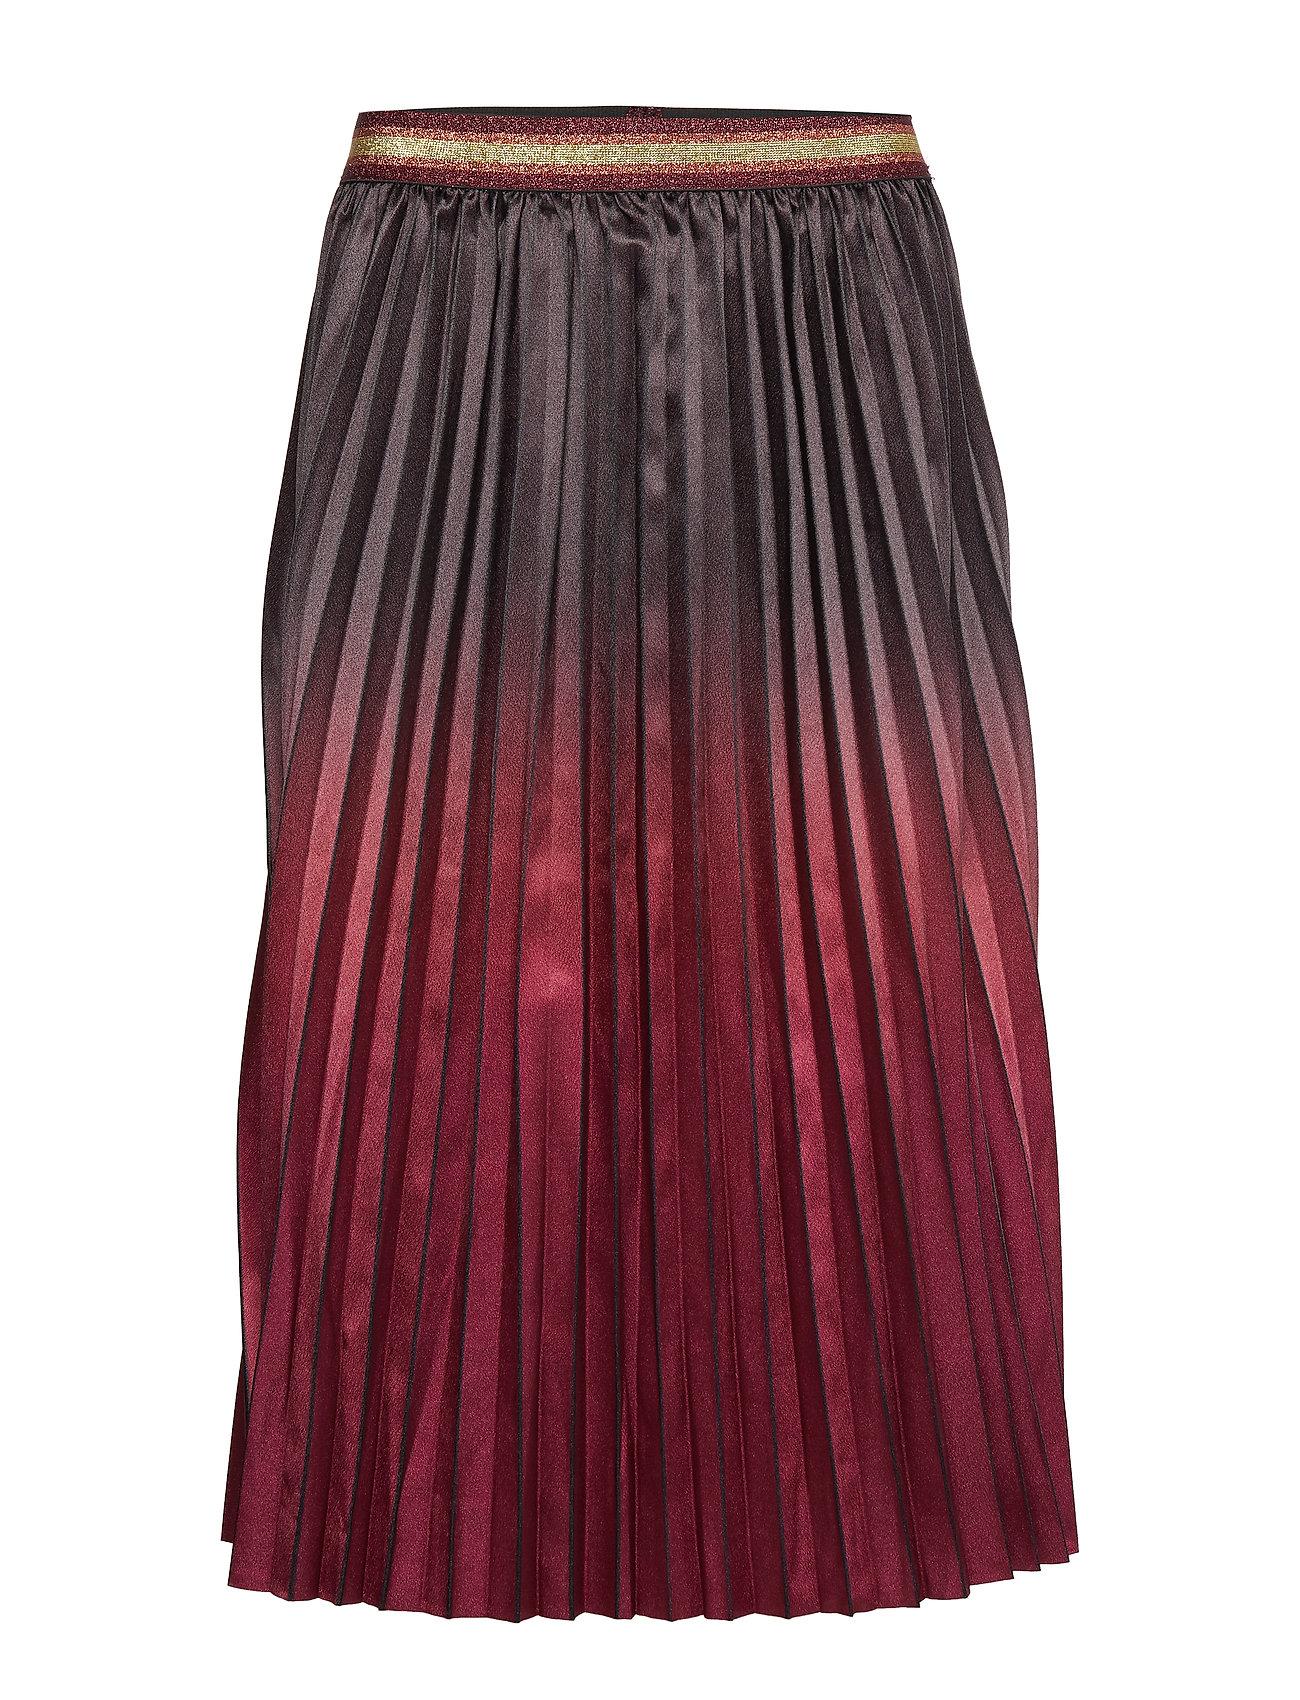 Sofie Schnoor Skirt - EARTH RED